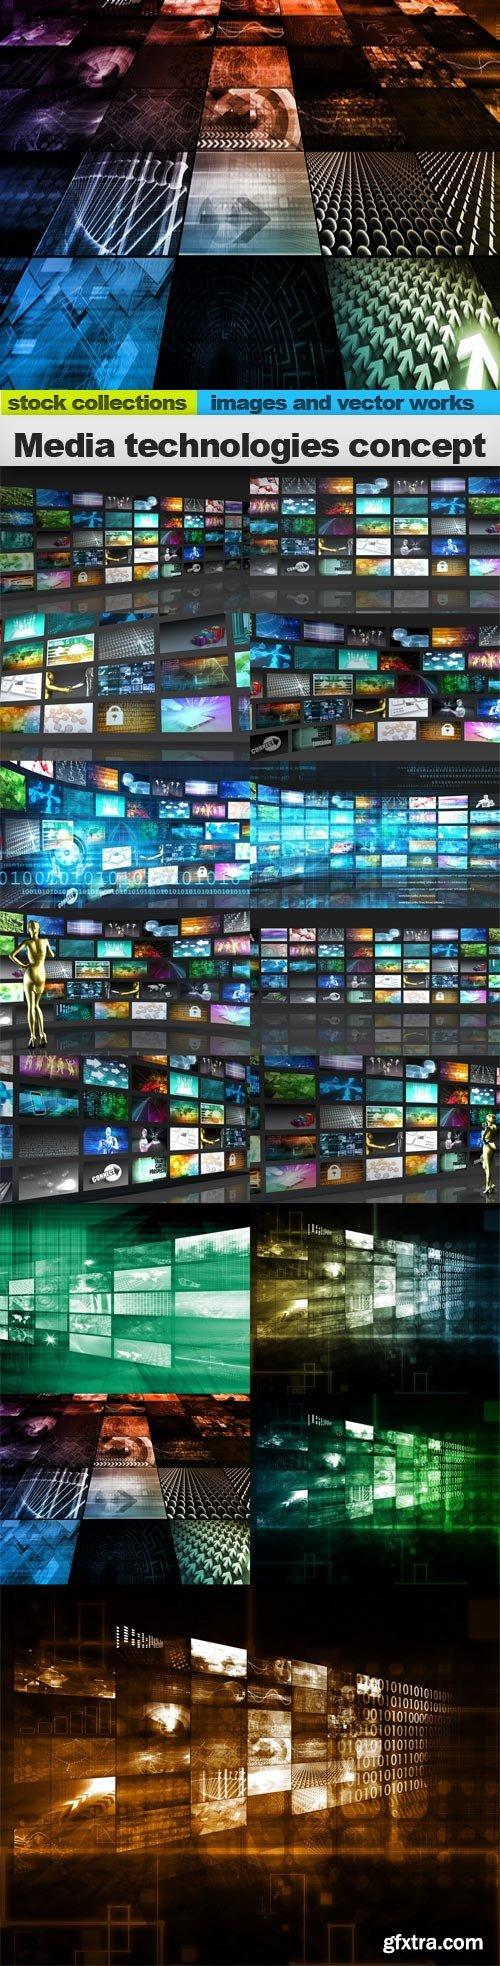 Media technologies concept, 15 x UHQ JPEG